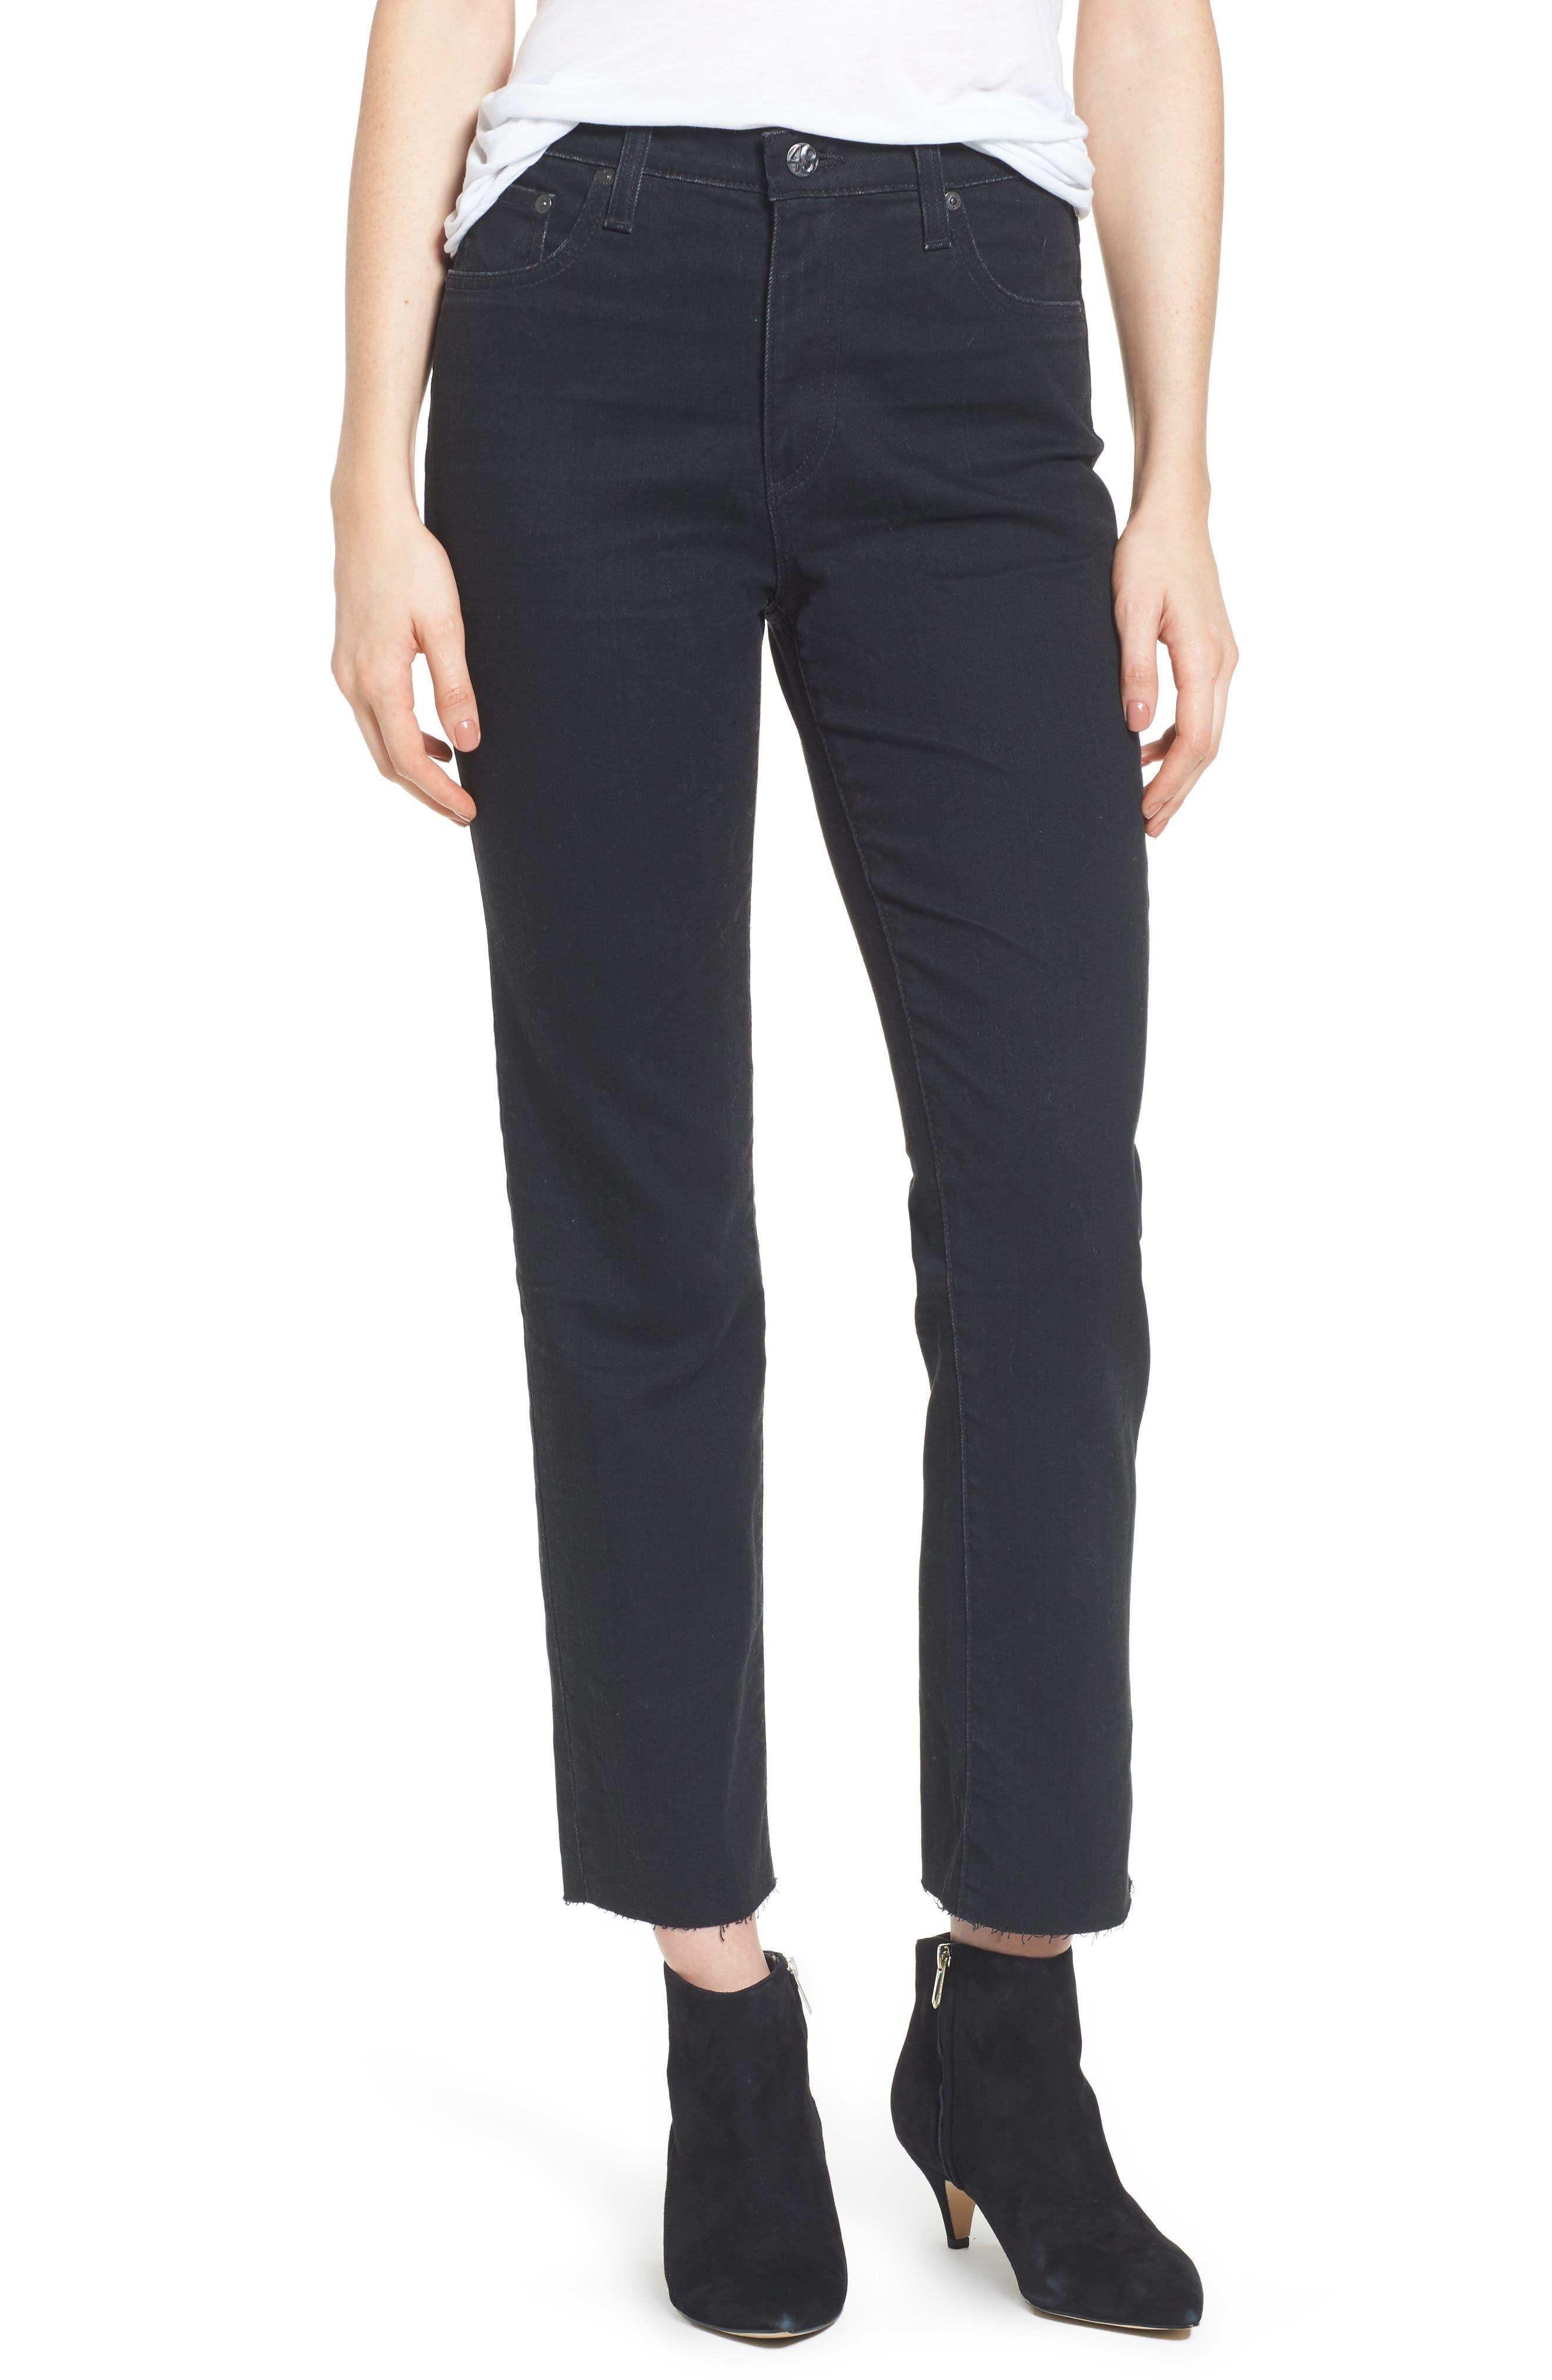 Main Image - AG The Isabelle High Waist Crop Straight Leg Jeans (1 Year Black Hawk)